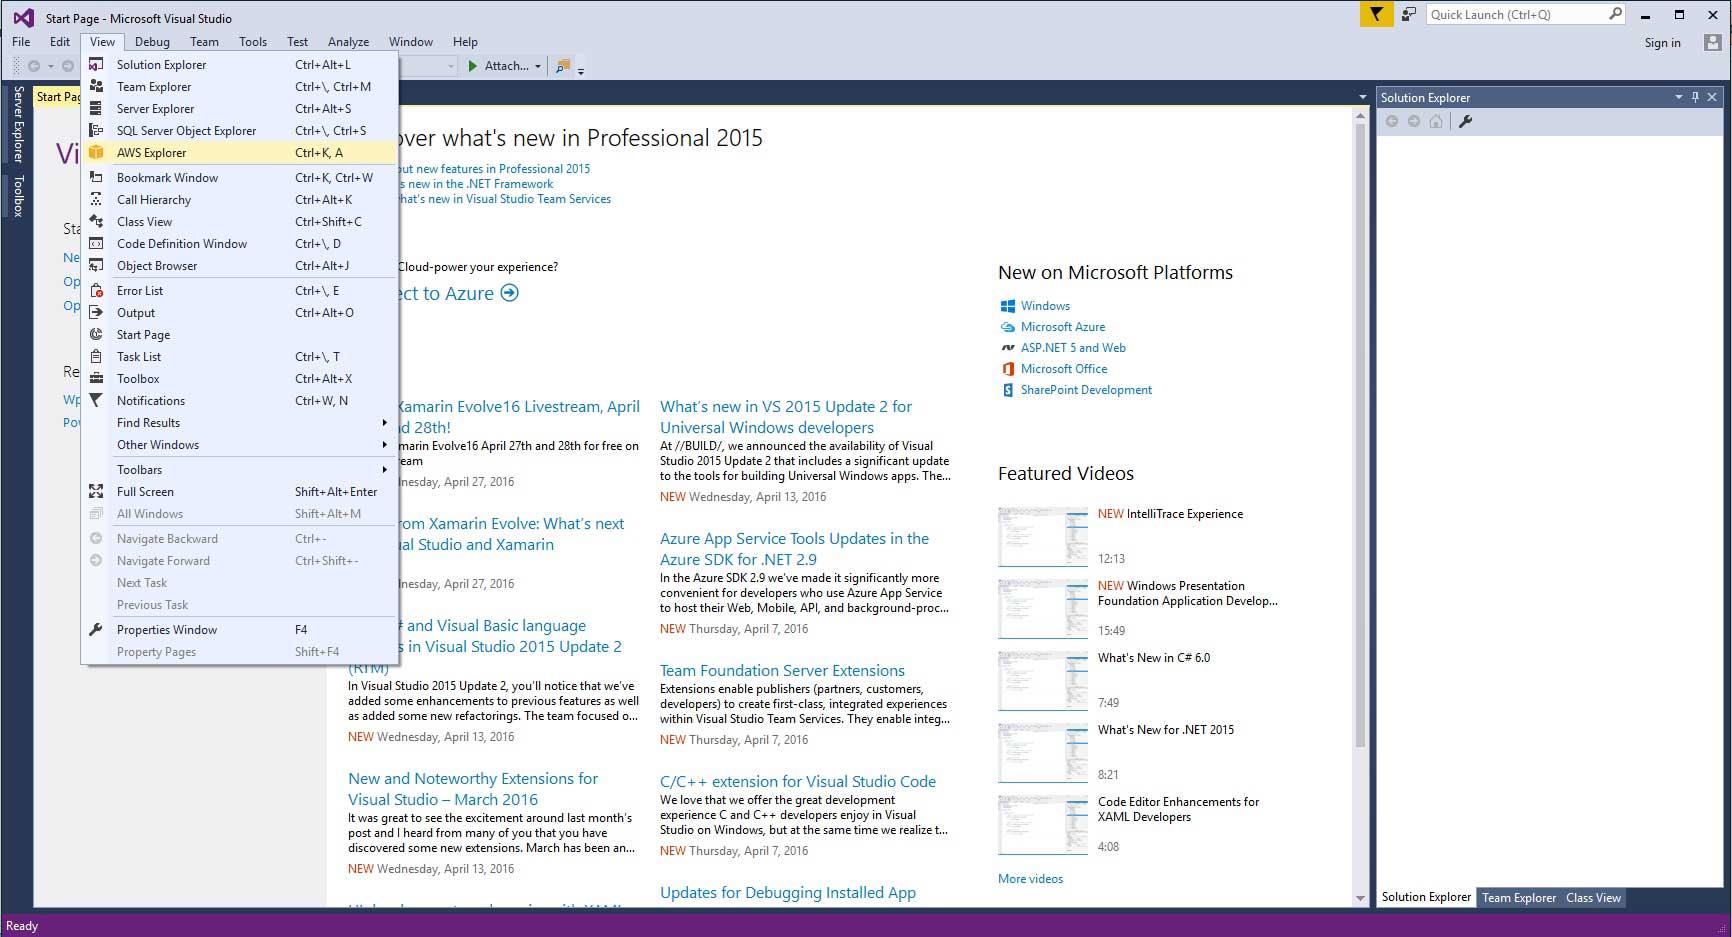 Typescript Sdk For Visual Studio 2017 Macos - high-powertag